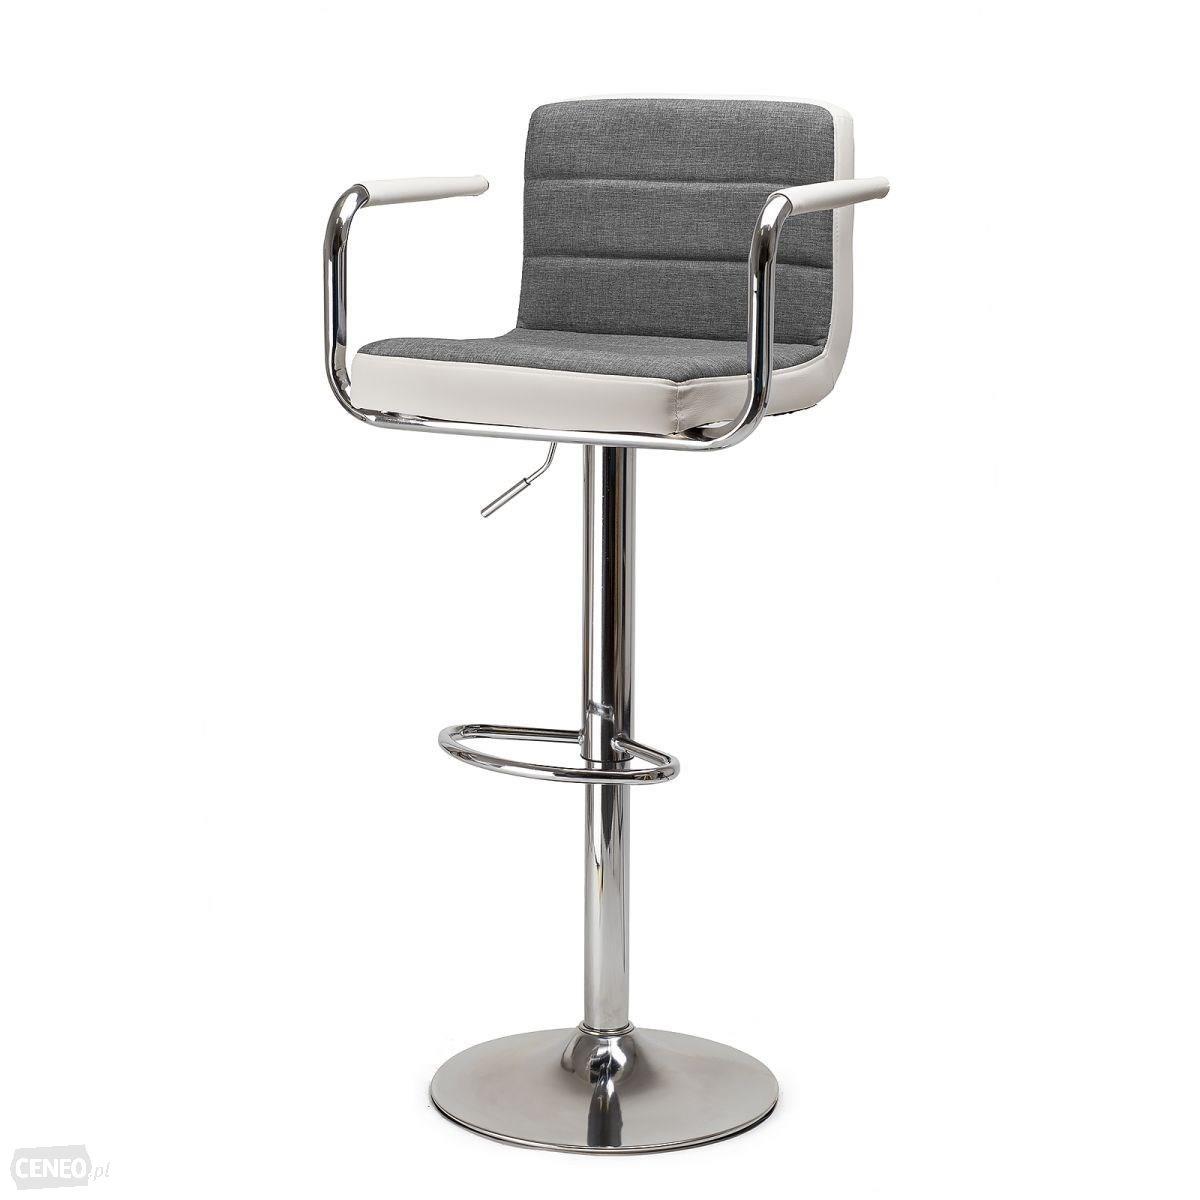 Hoker Krzesło Barowe Obrotowe Homekraft Tendo B335